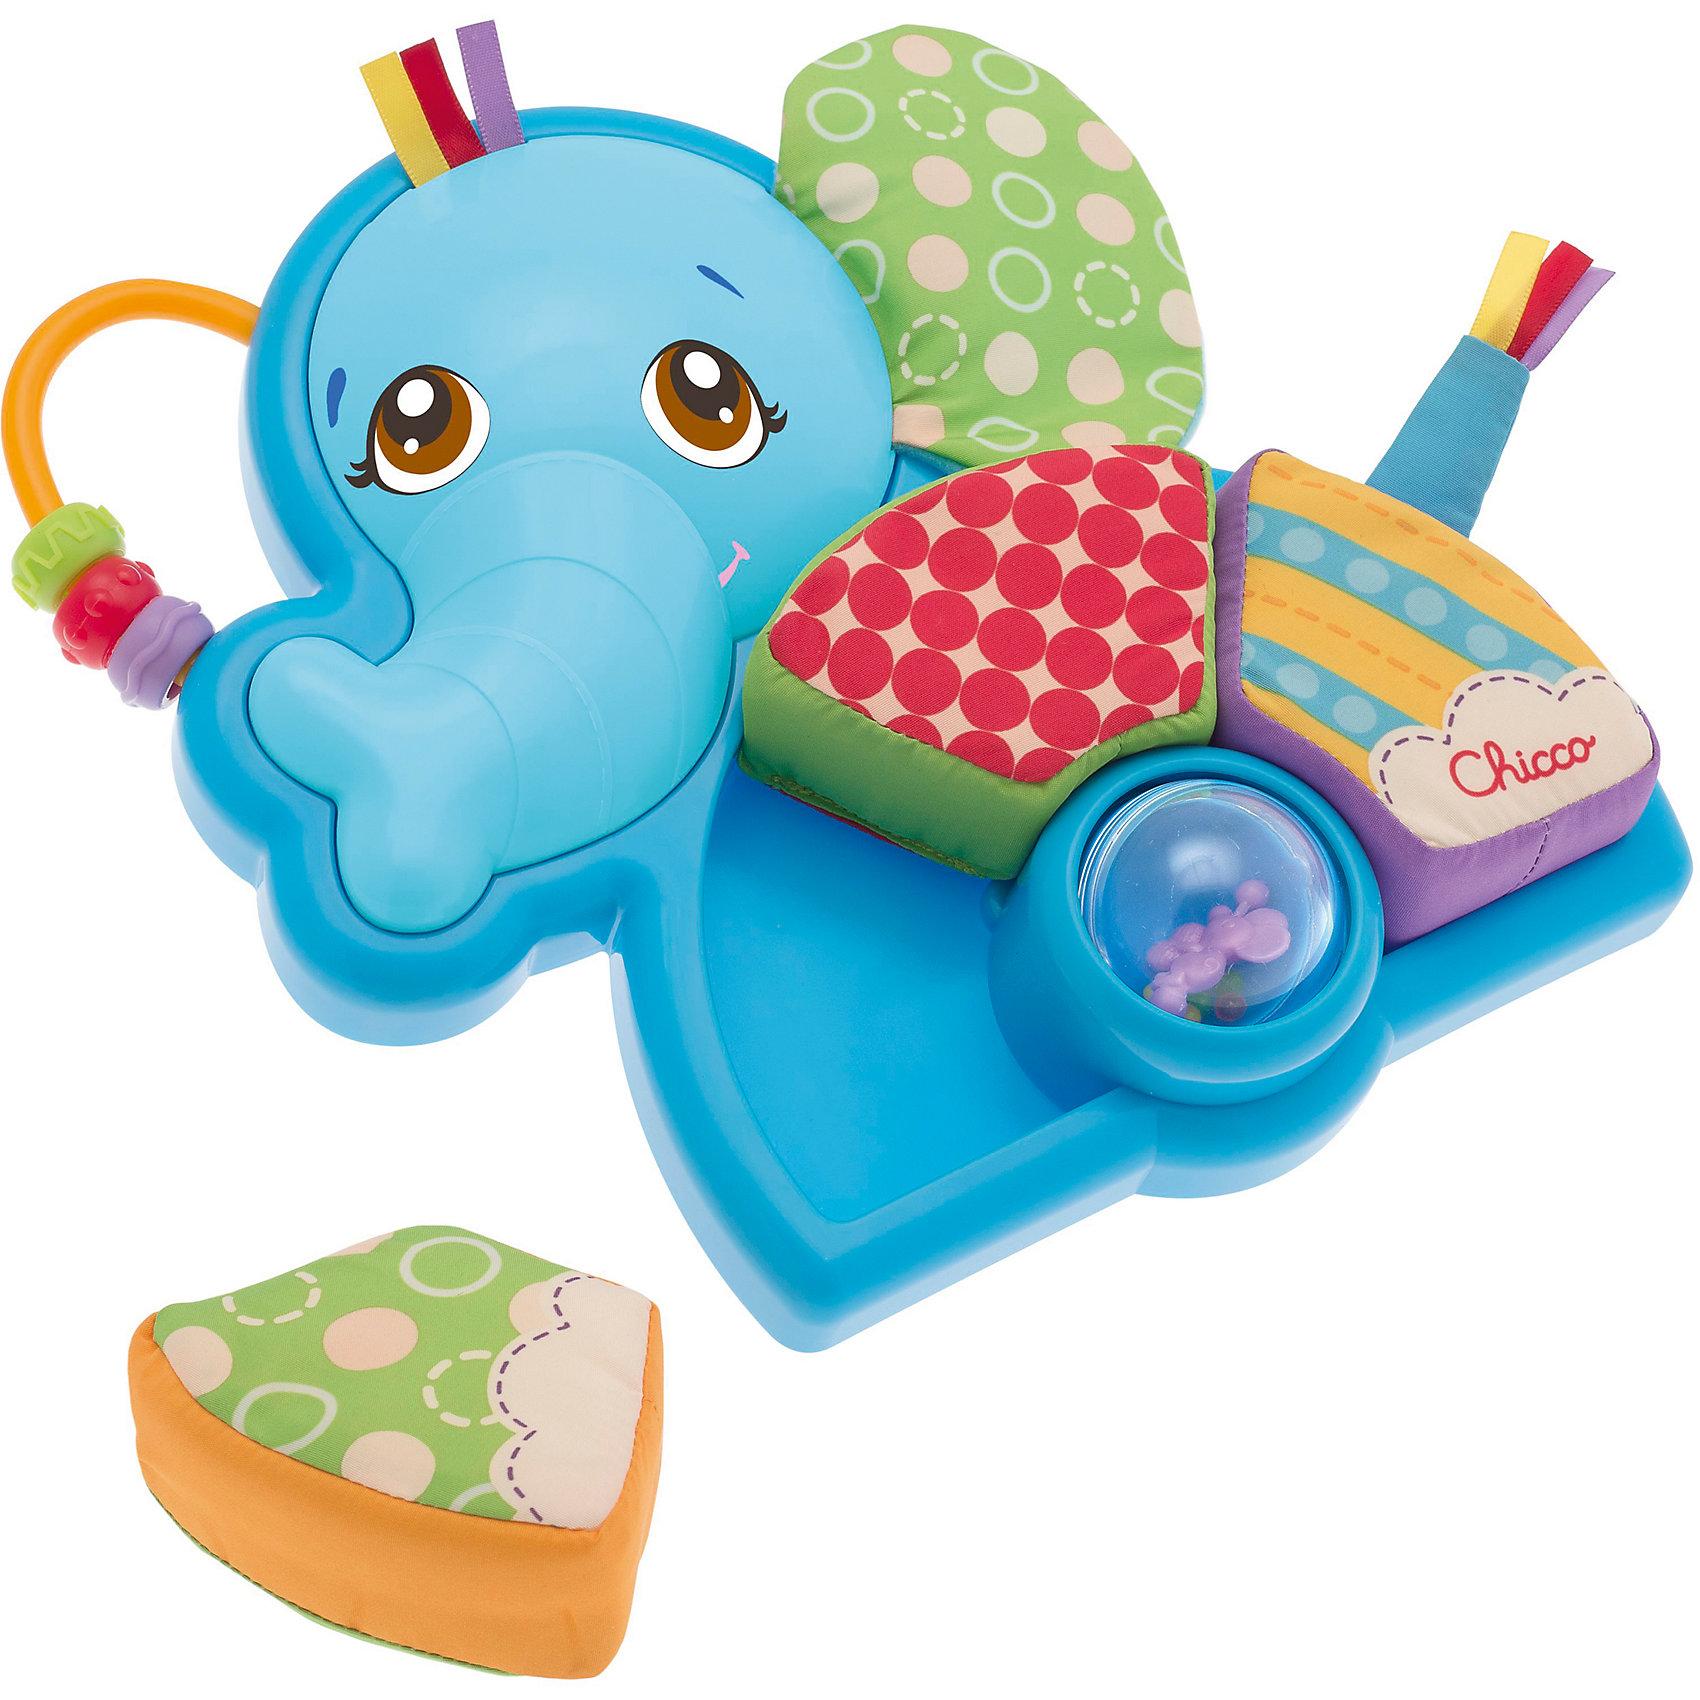 CHICCO Погремушка-пазл Мистер Слоненок, Chicco погремушки chicco погремушка слоненок